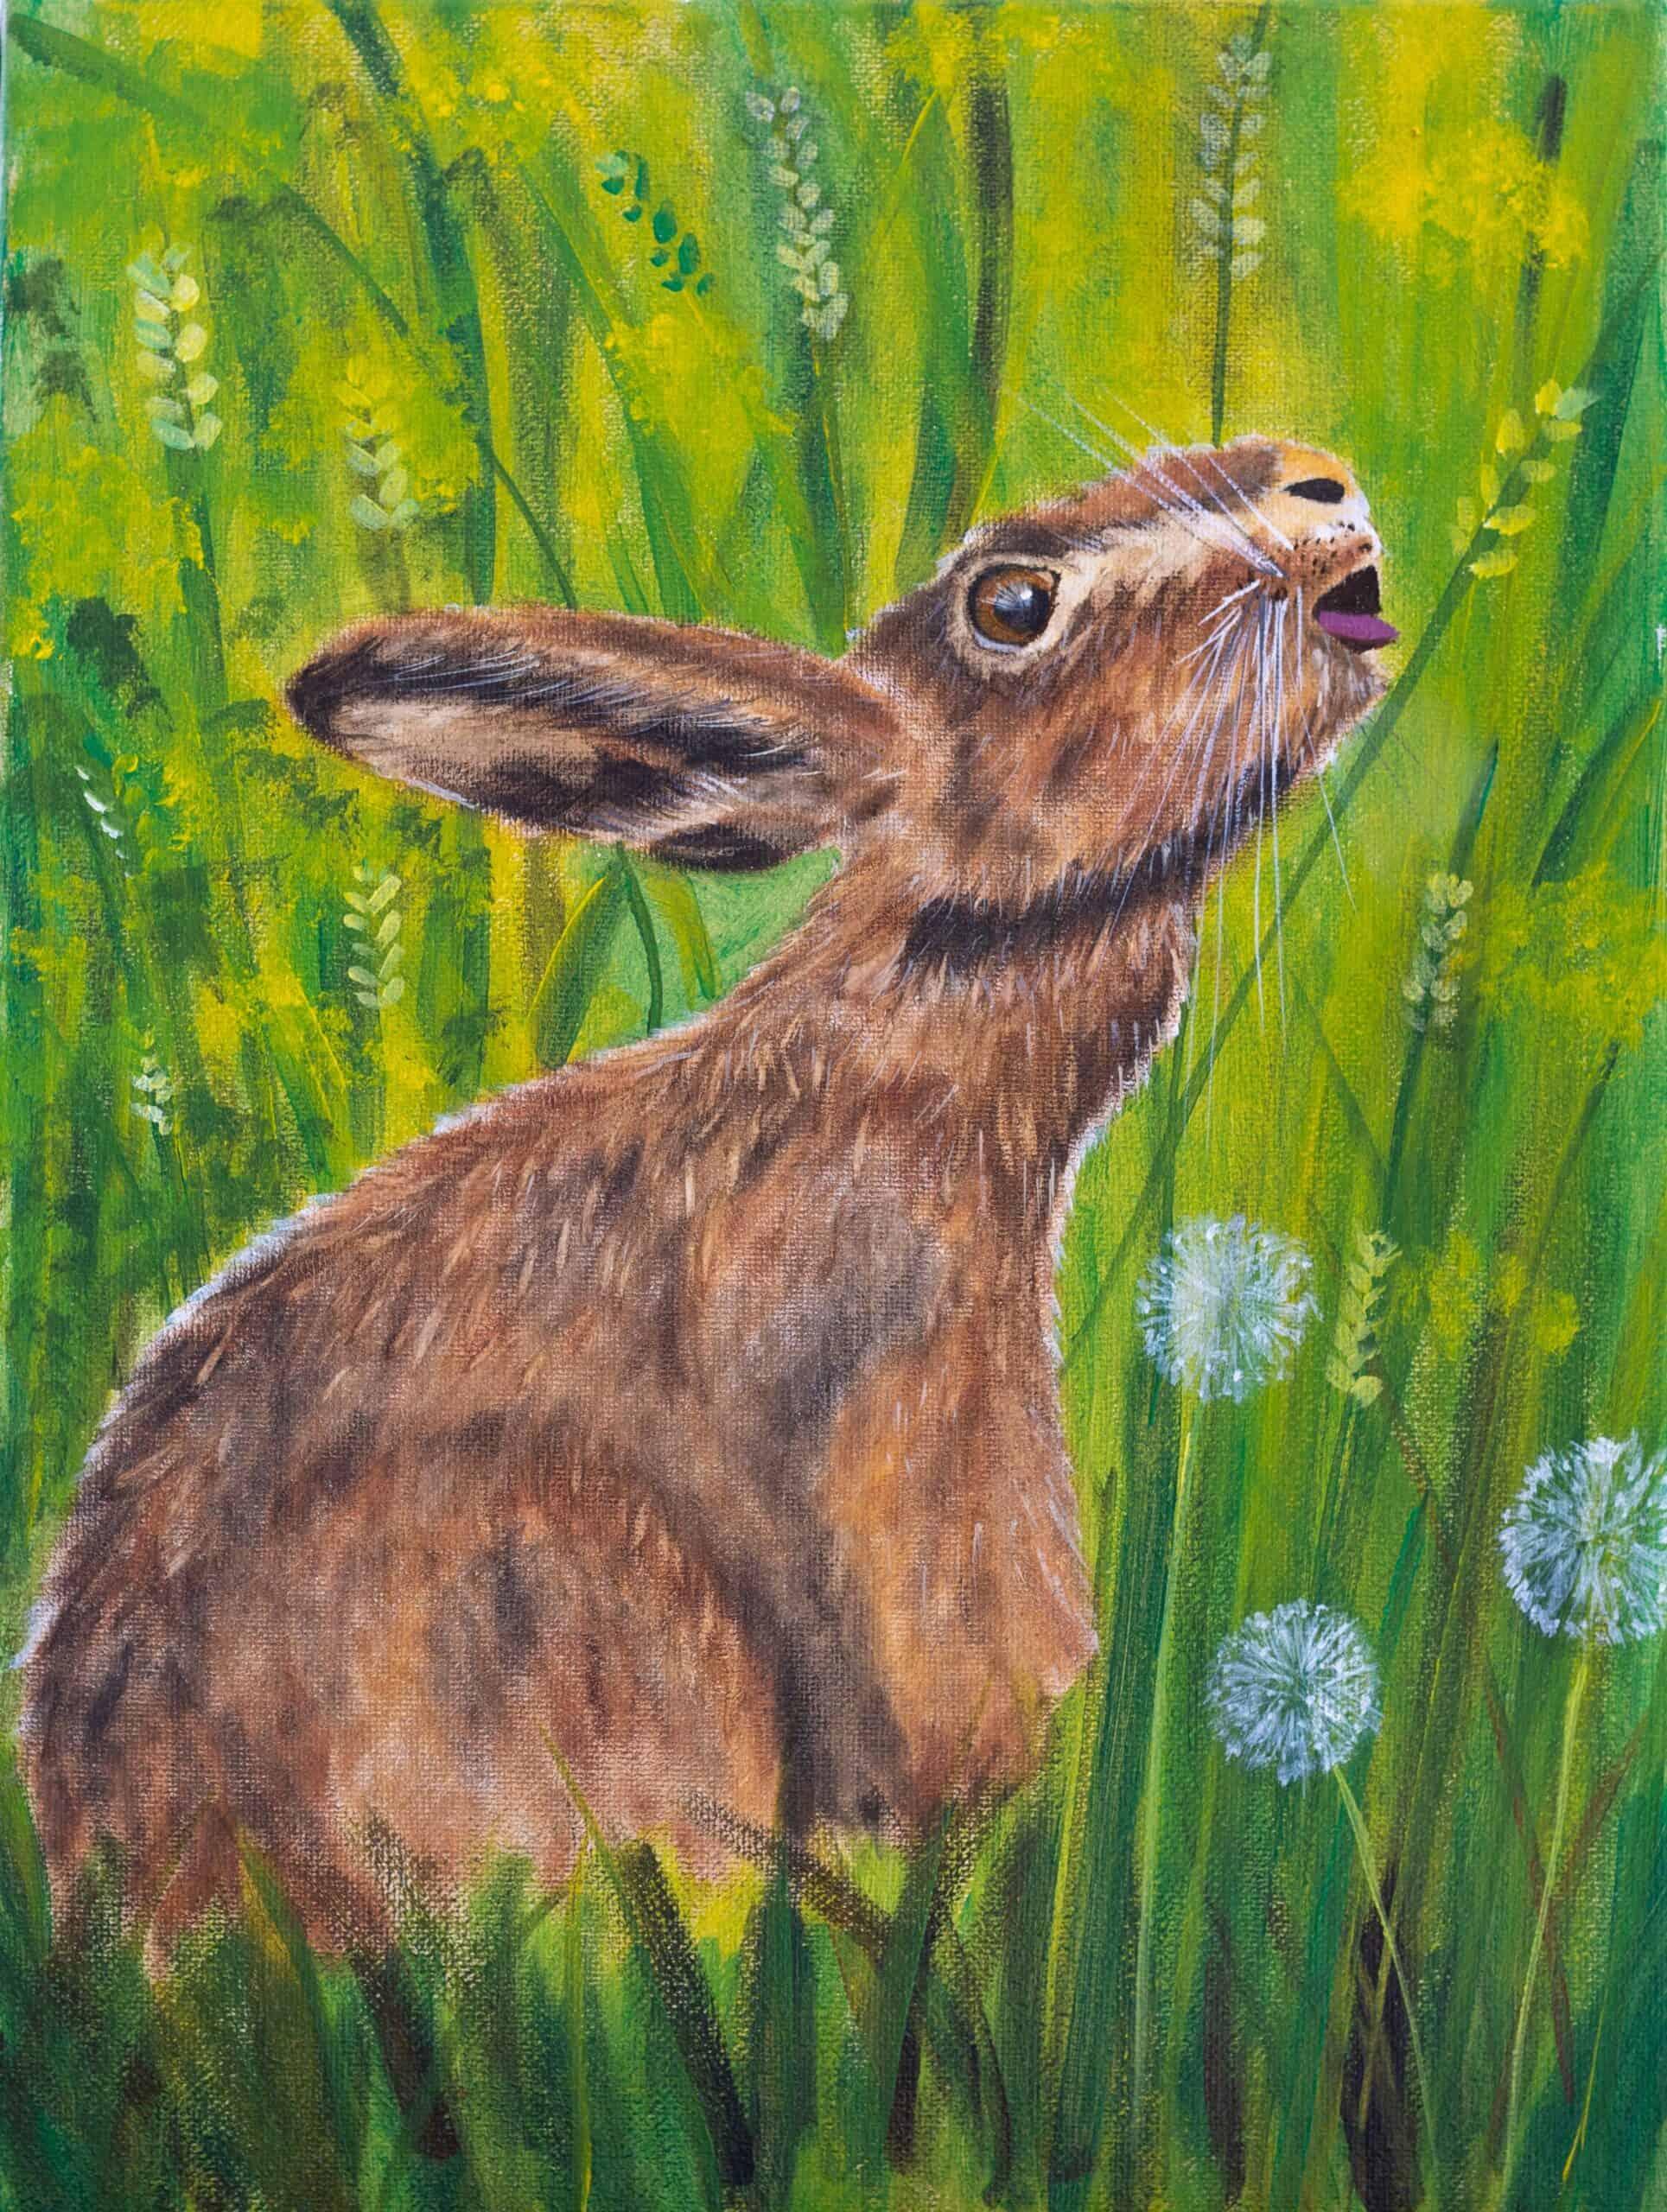 Dandelion Hare